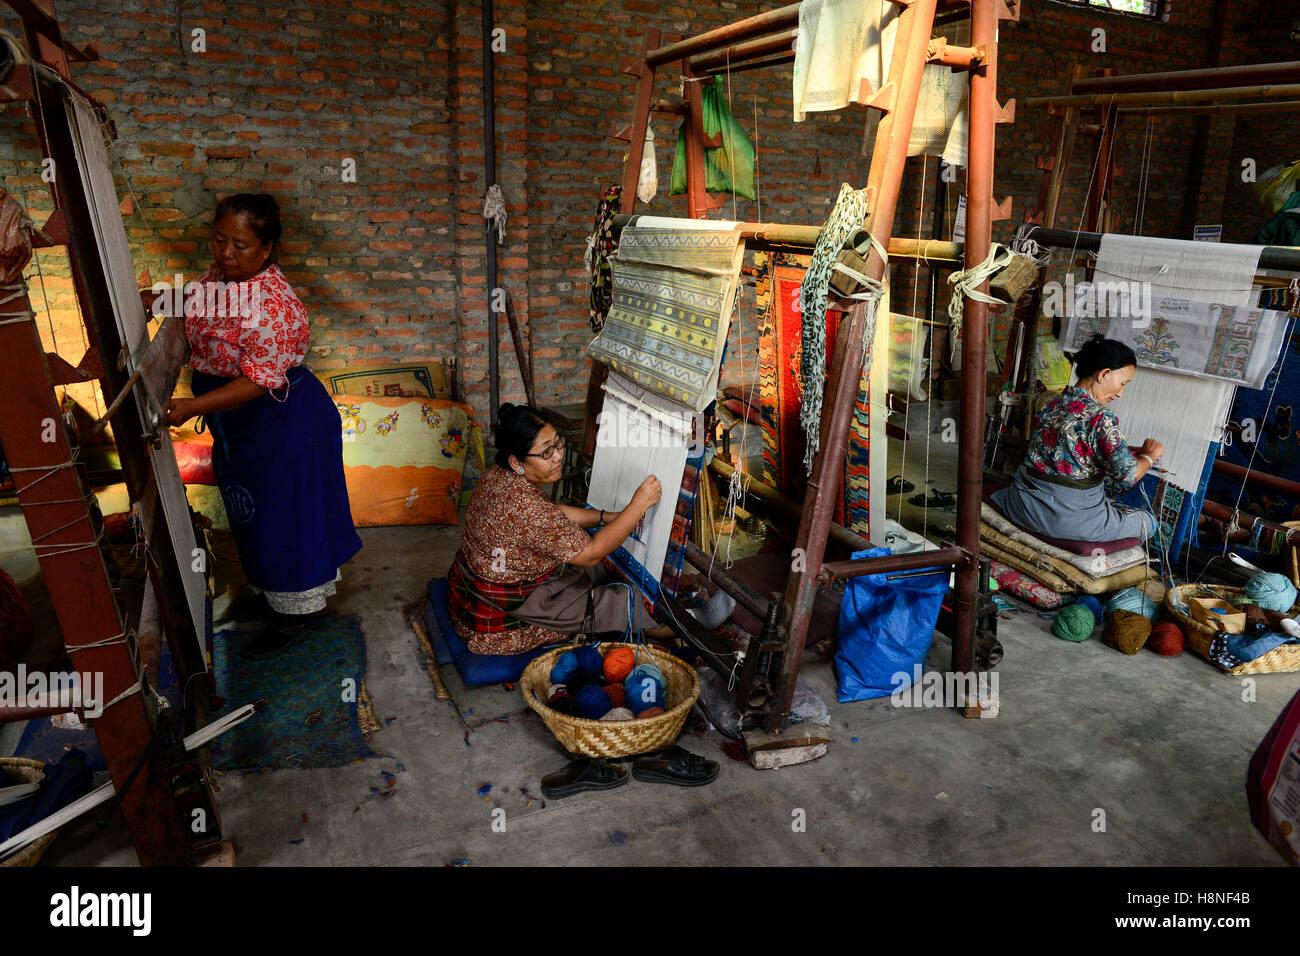 Nepal Kathmandu Lalitpur Tibetan Refugee Camp Jawalakhel